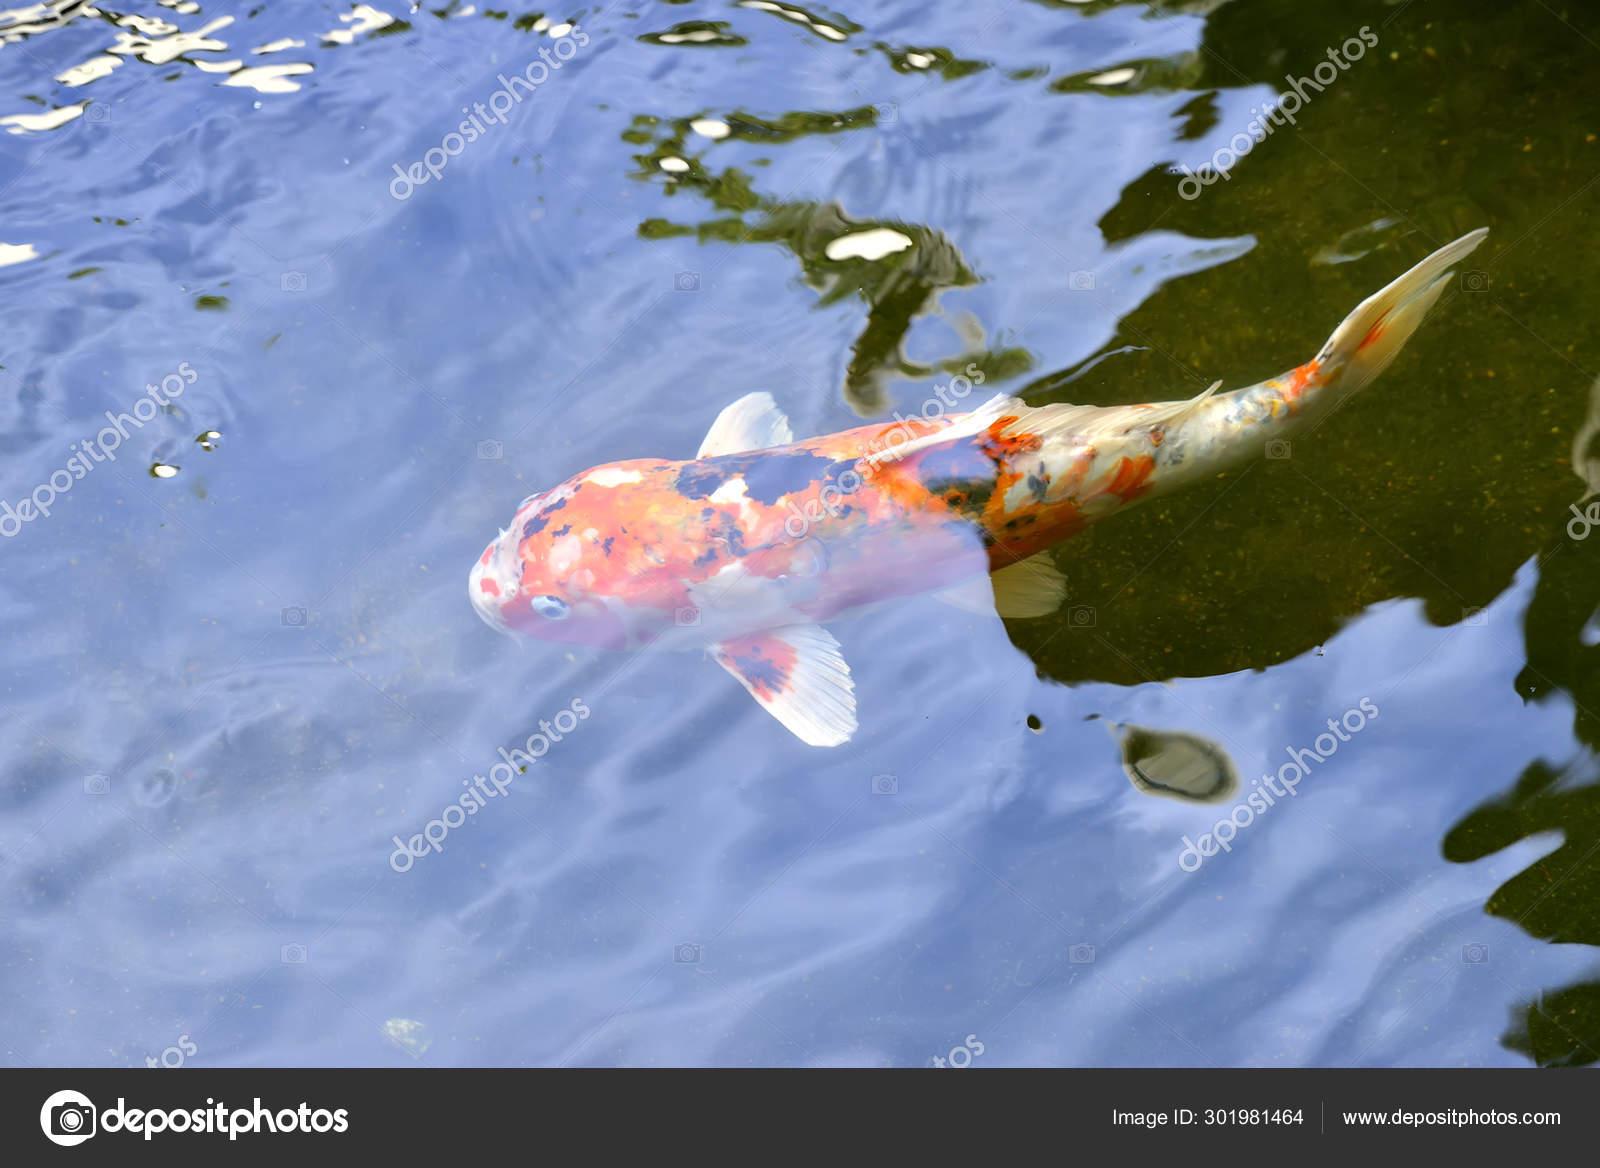 Colorful Japanese Koi Carp Fish Lovely Pond Selective Focus Stock Photo C Tristantan71 301981464